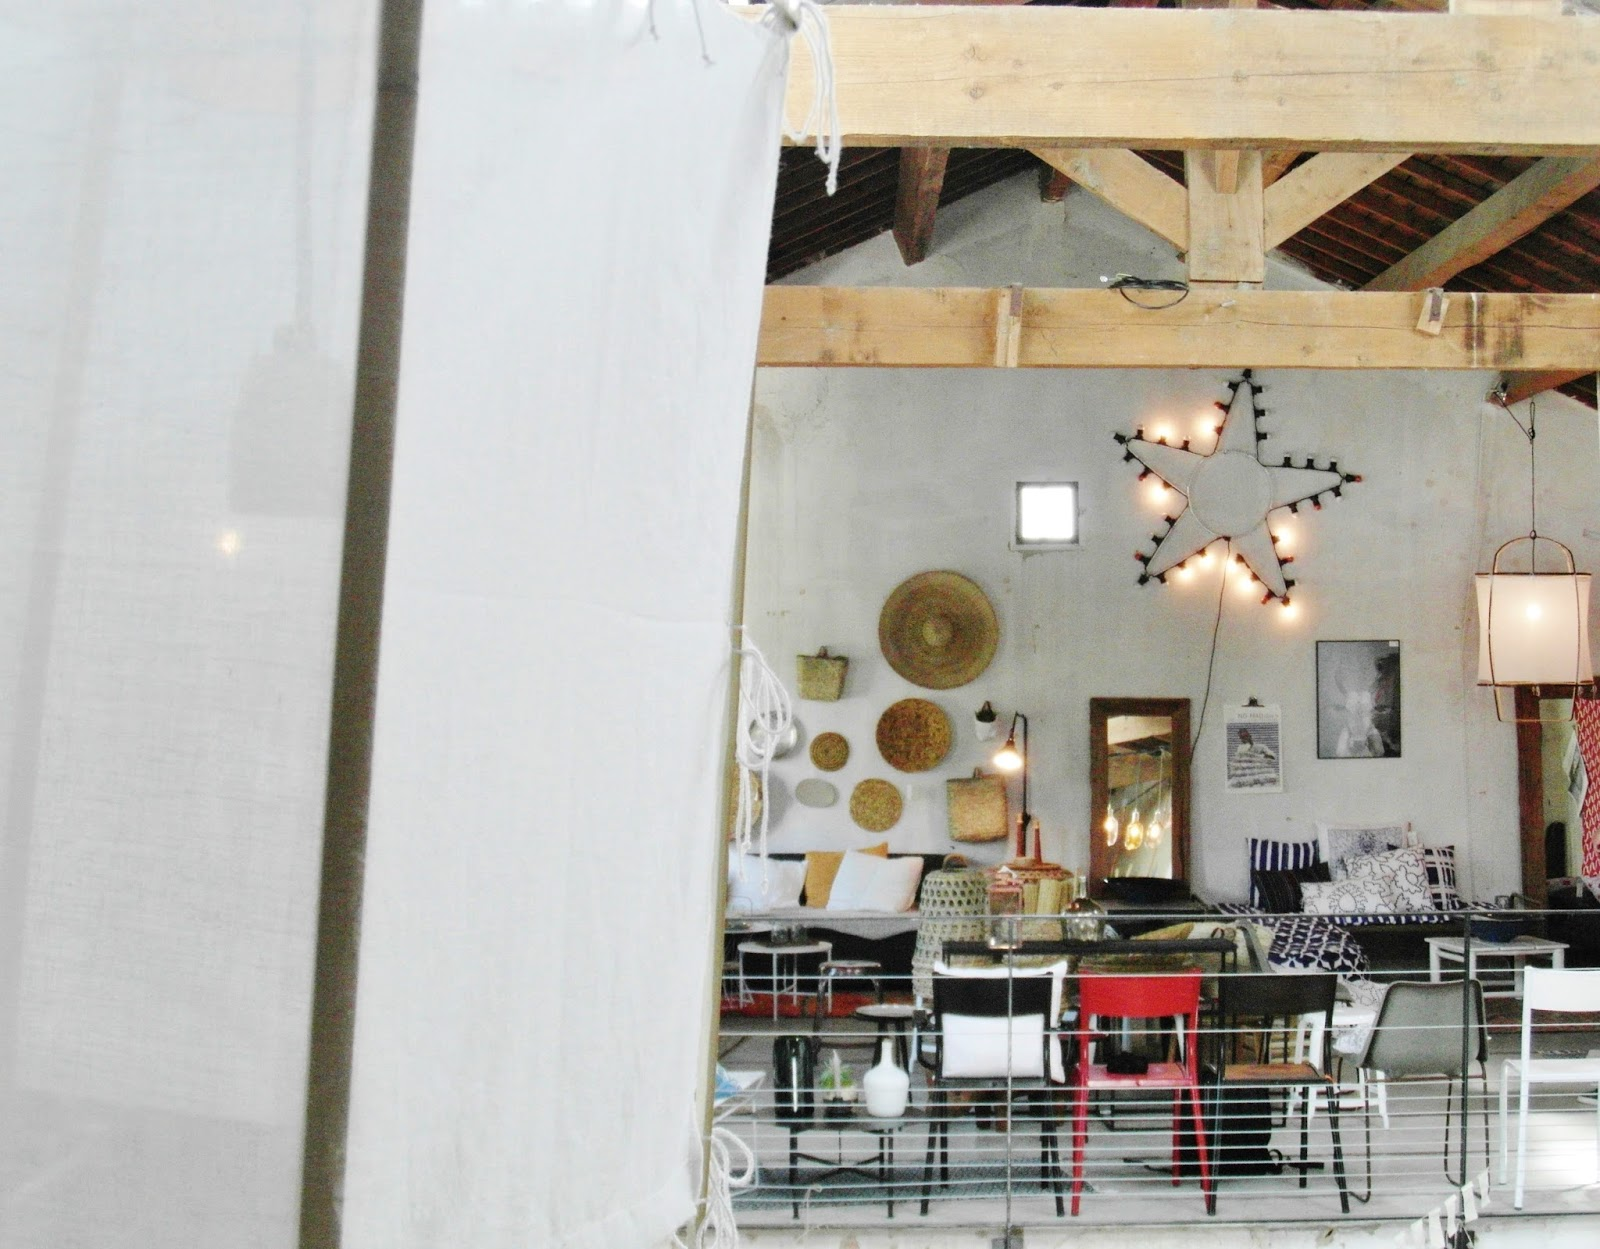 elv 39 s shoplove la maison pernoise. Black Bedroom Furniture Sets. Home Design Ideas